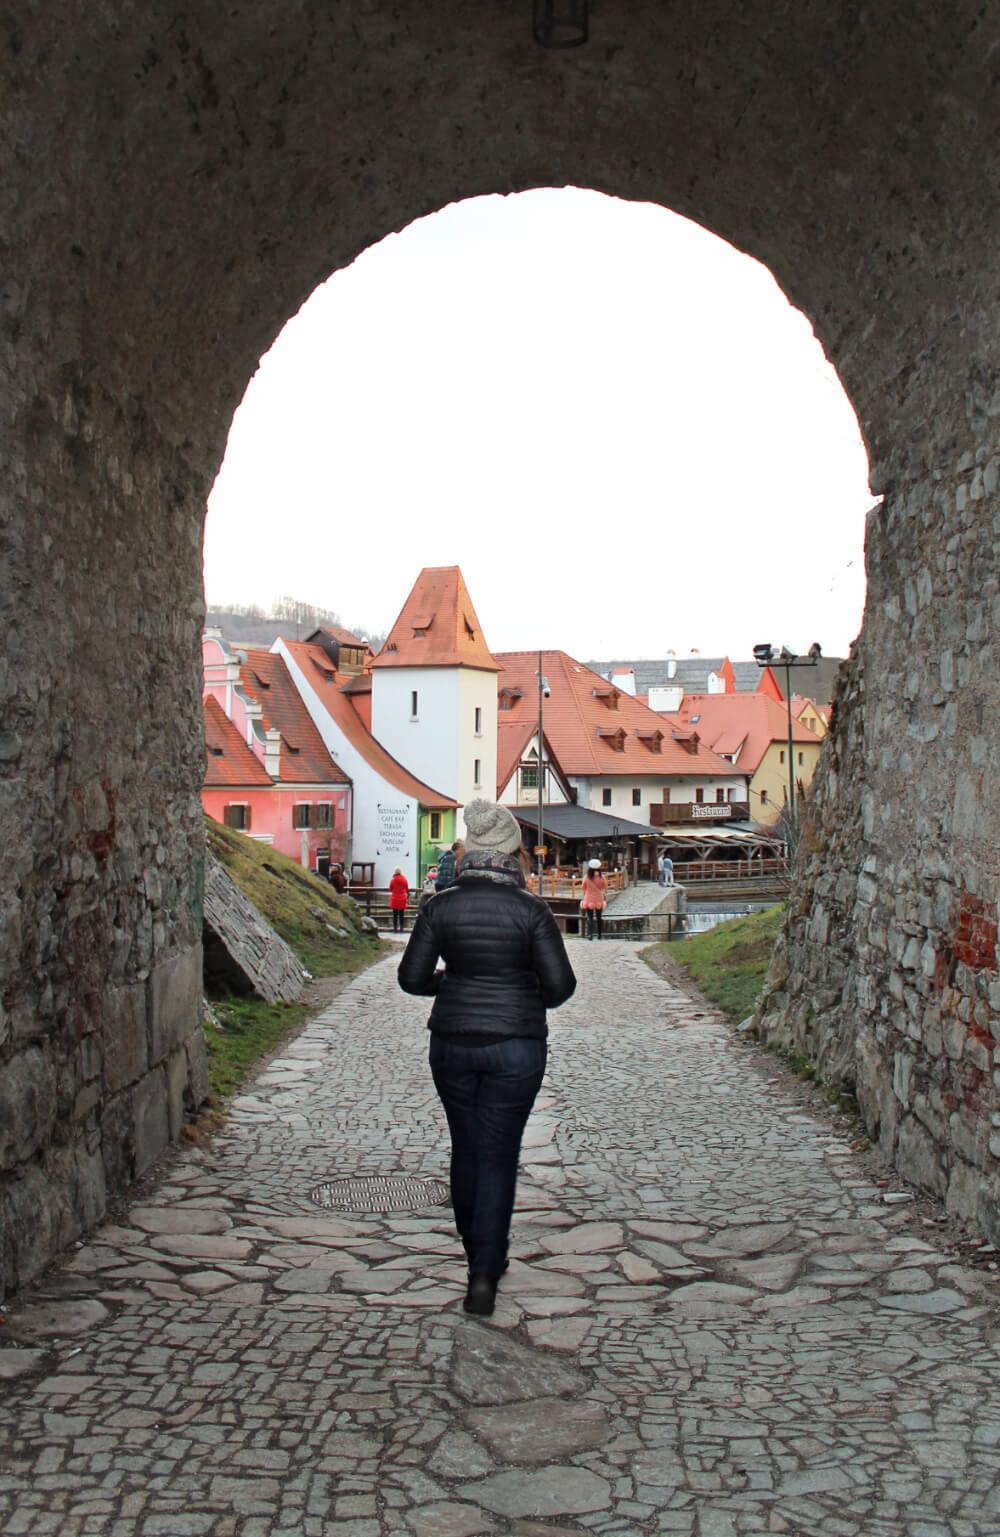 Exploring the castle in Cesky Krumlov, a UNESCO world heritage site in the Czech Republic.